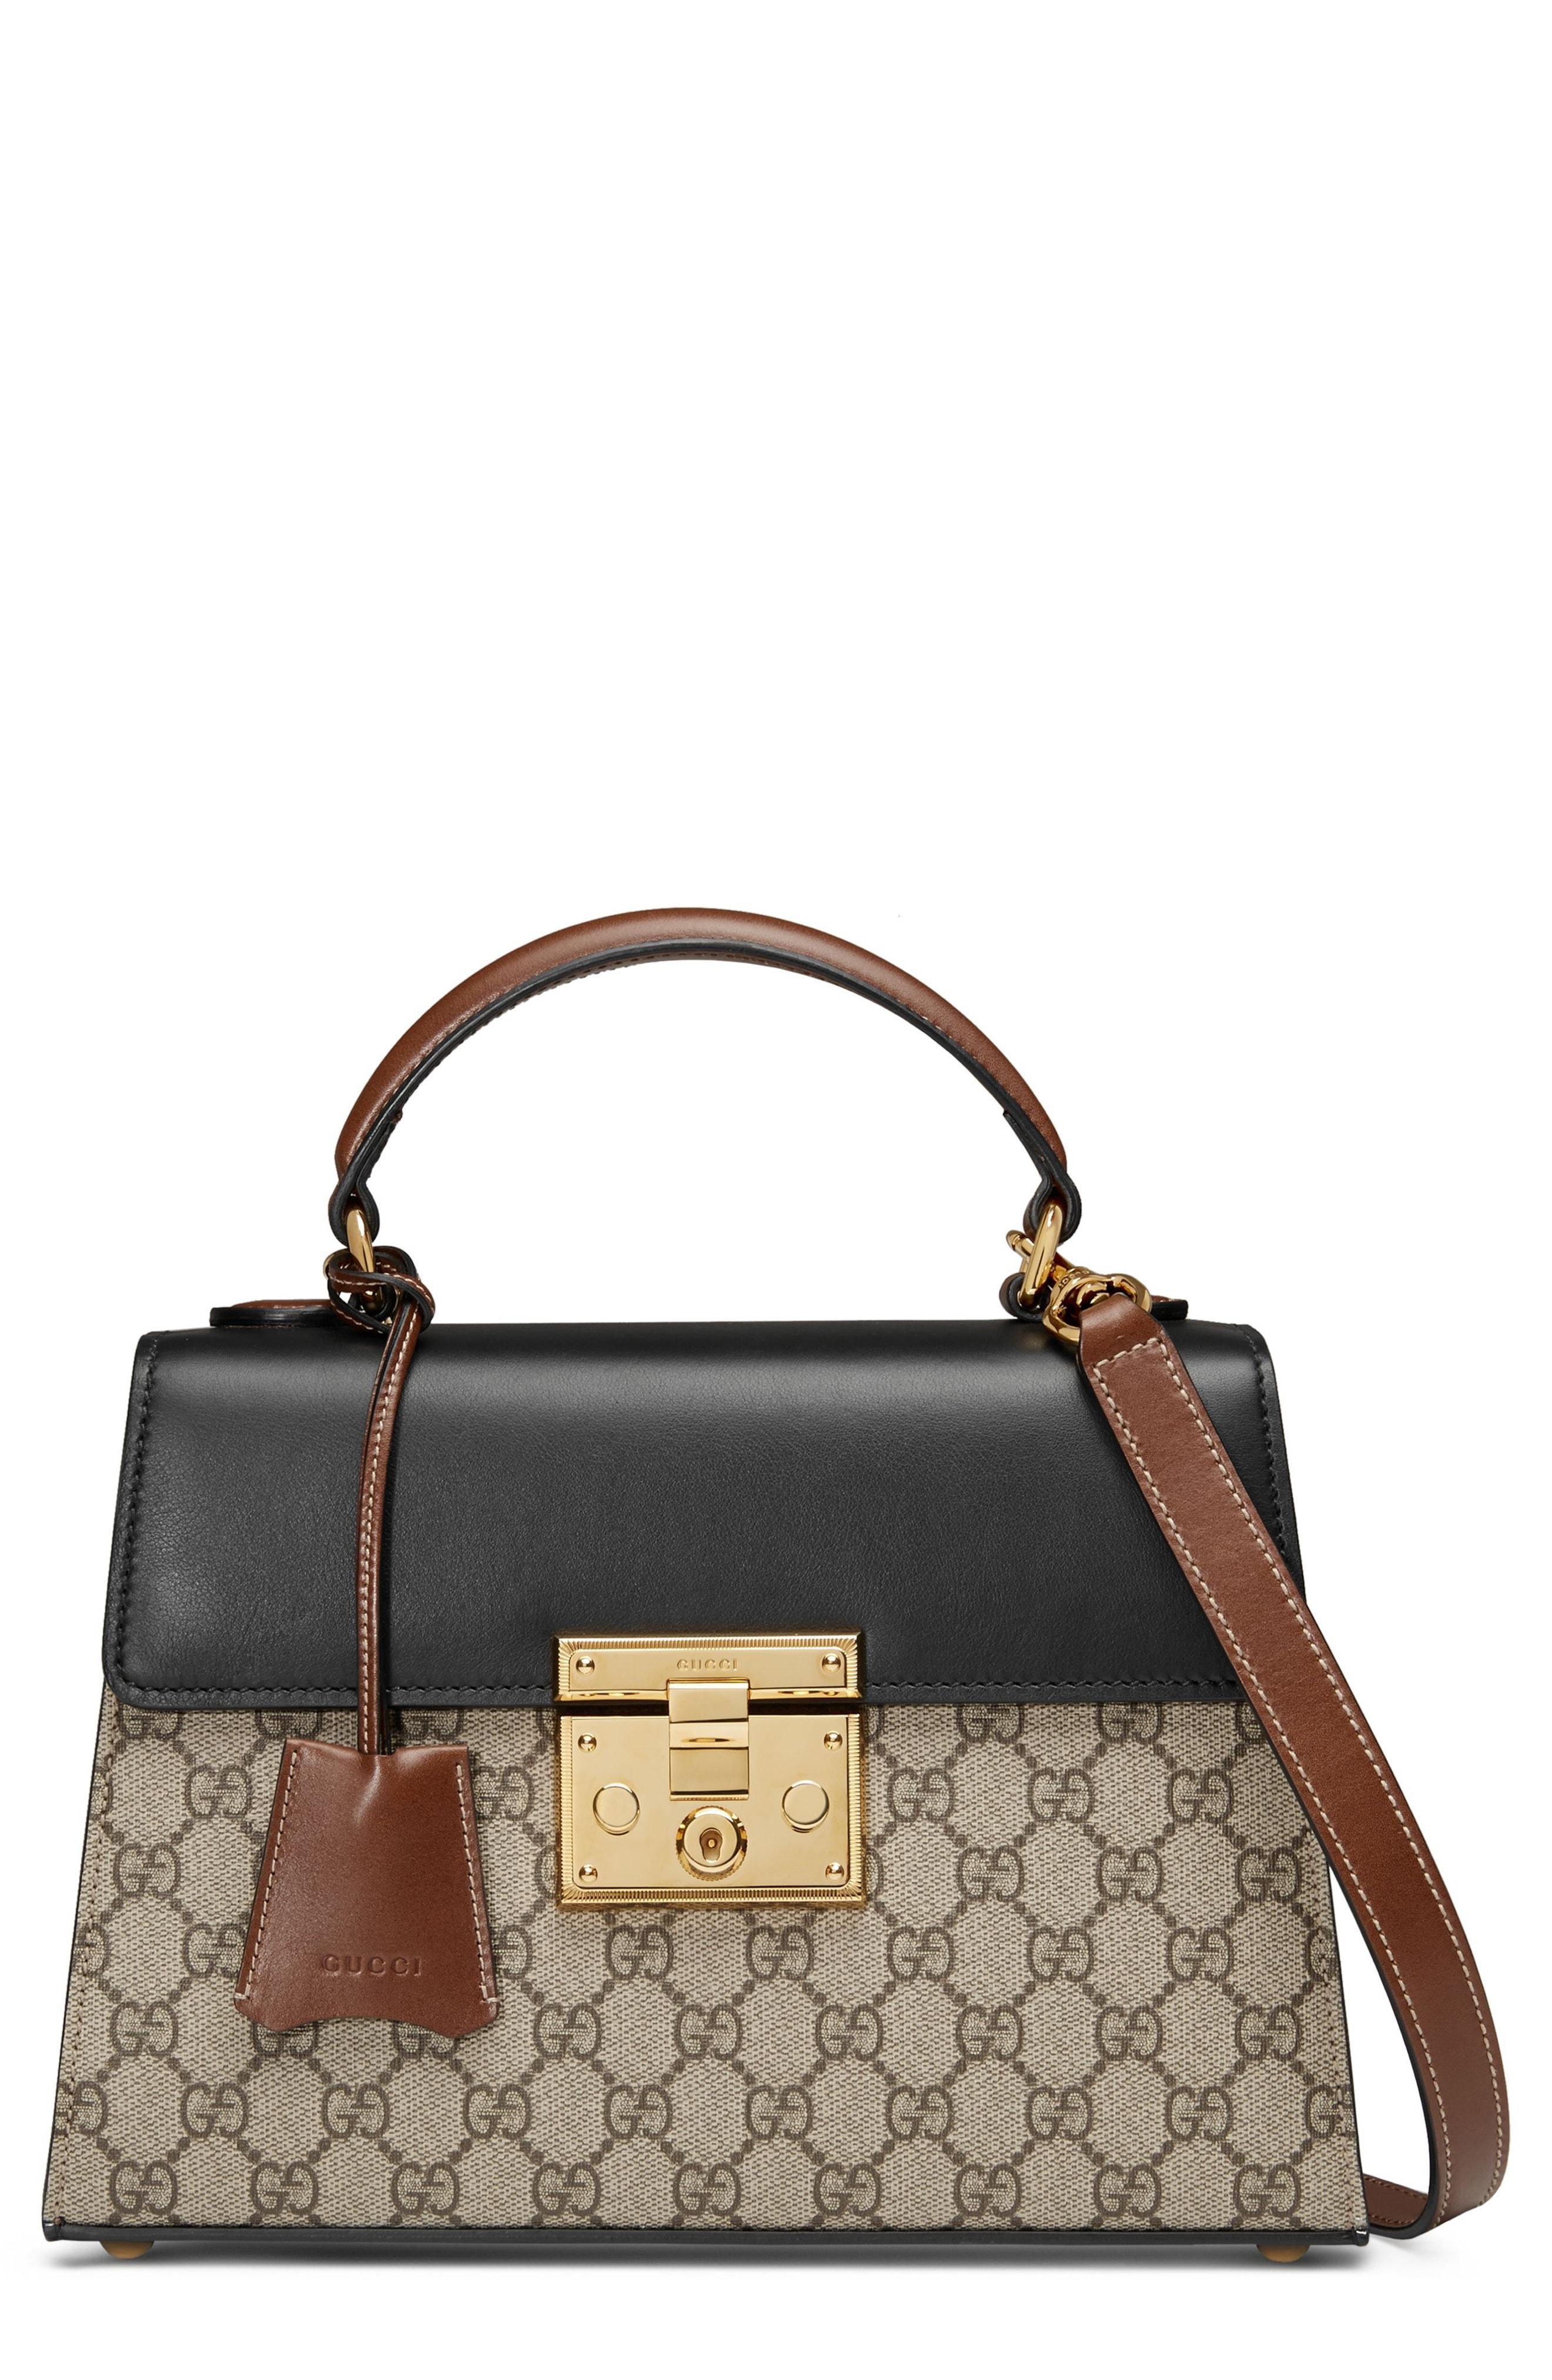 a0422e79f4cf Gucci Small Padlock Gg Supreme Canvas   Leather Top Handle Satchel - Beige  In Neutrals